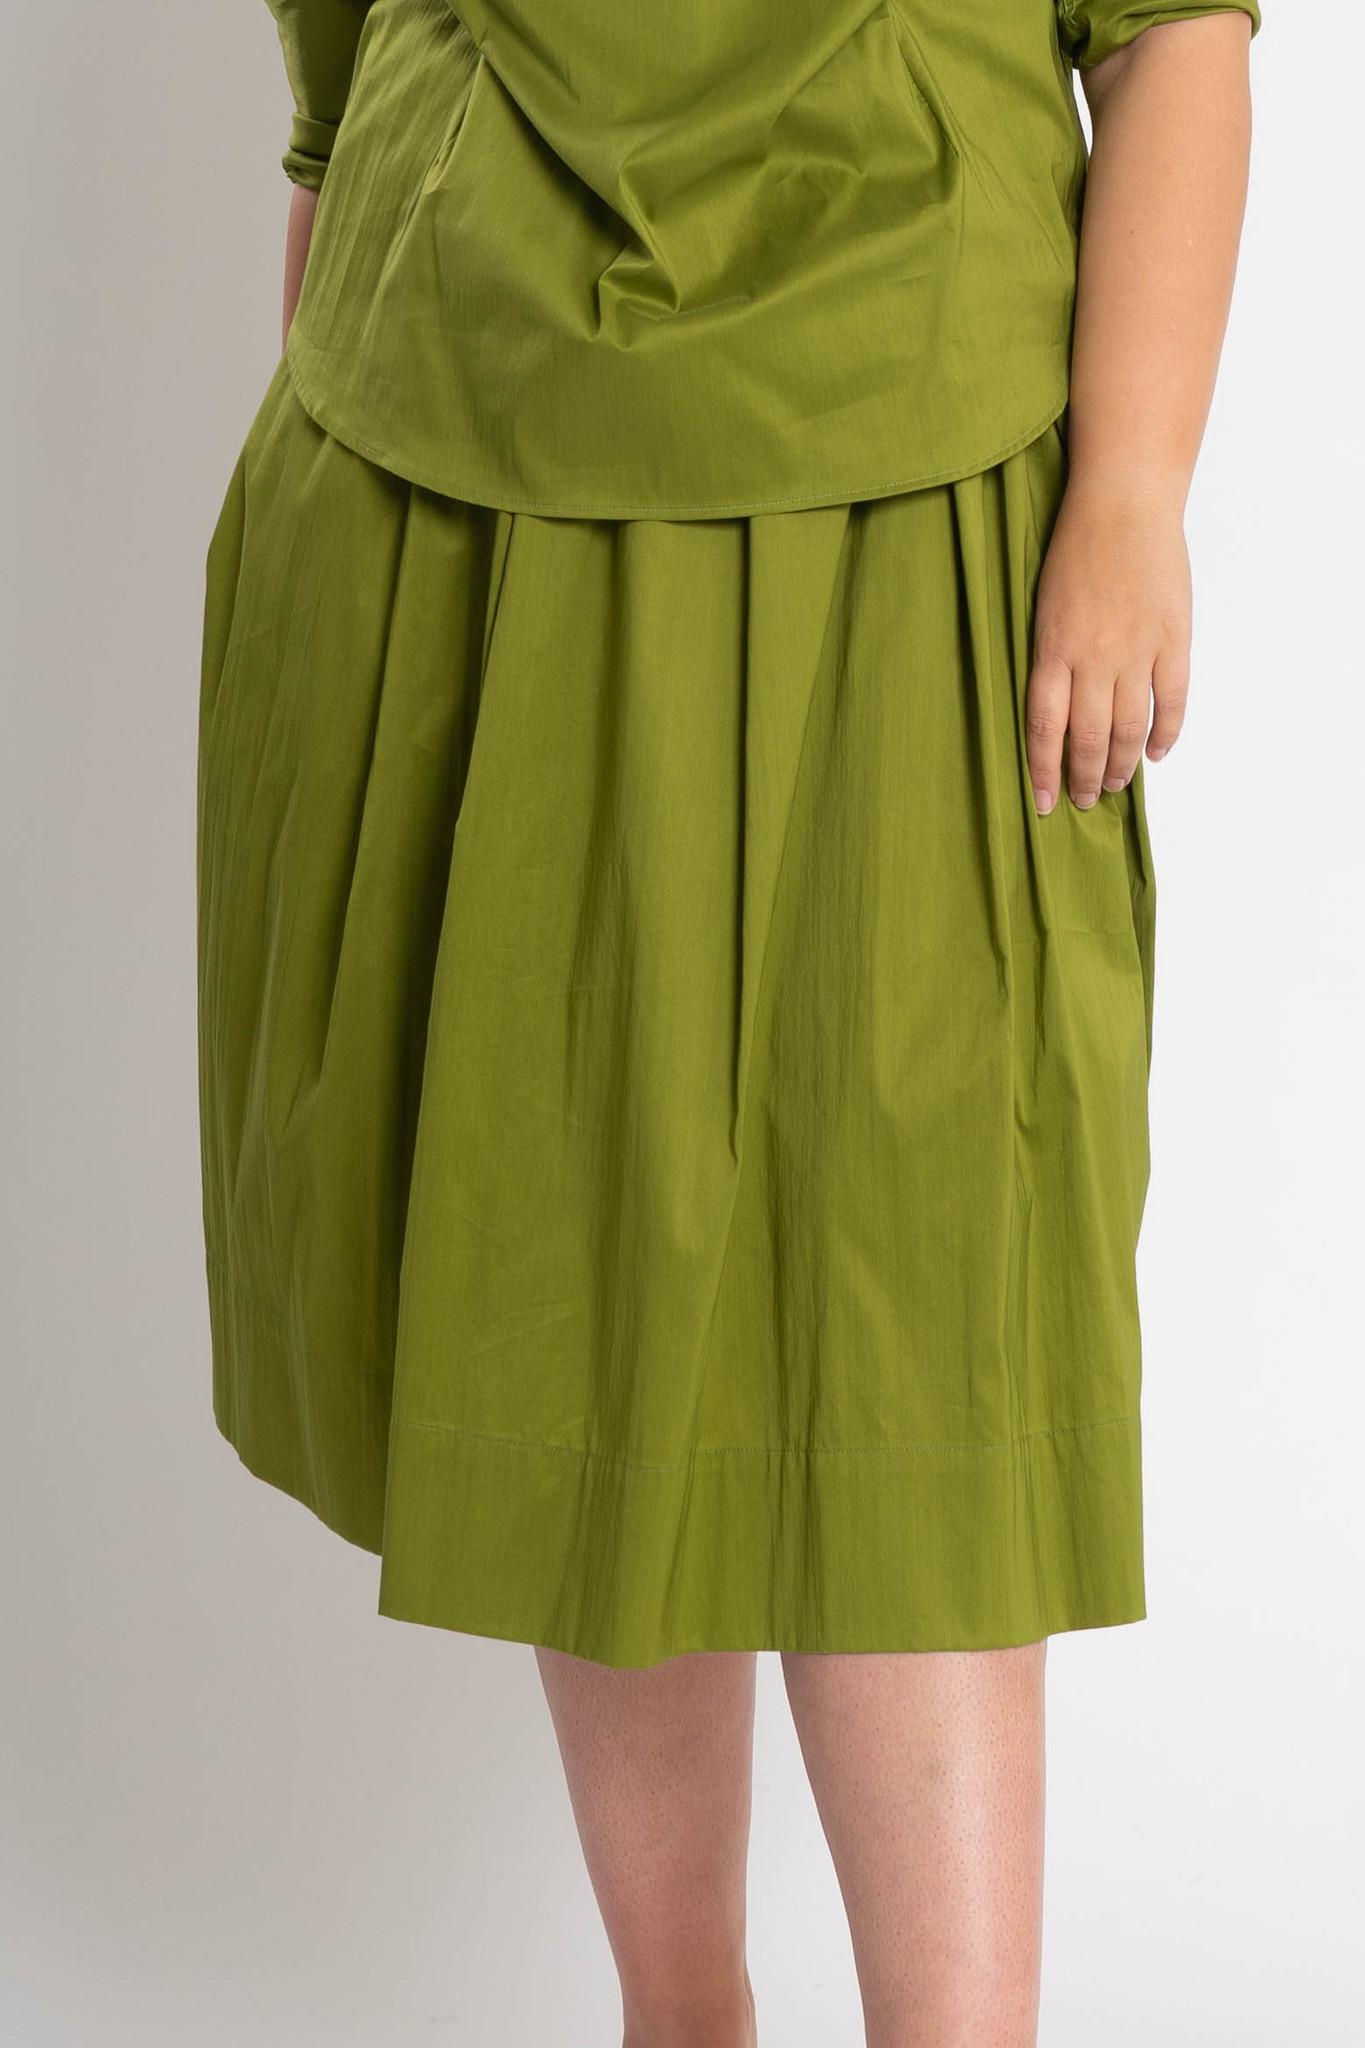 TULIP Skirt in Cotton Popeline stretch-1